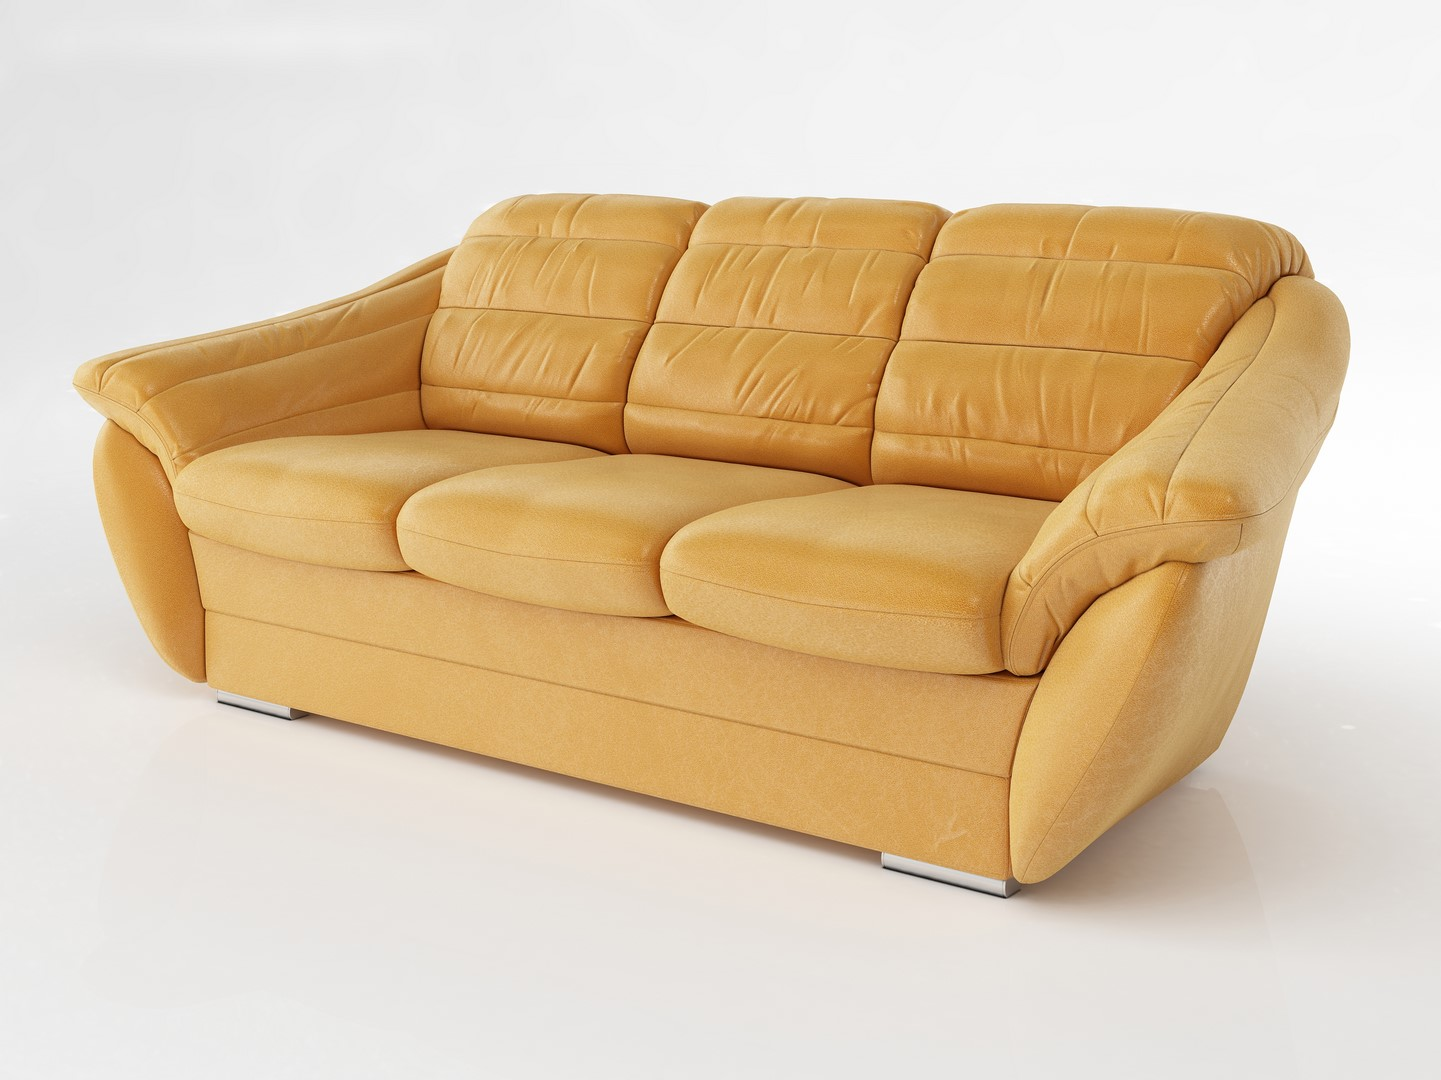 Лучано диван